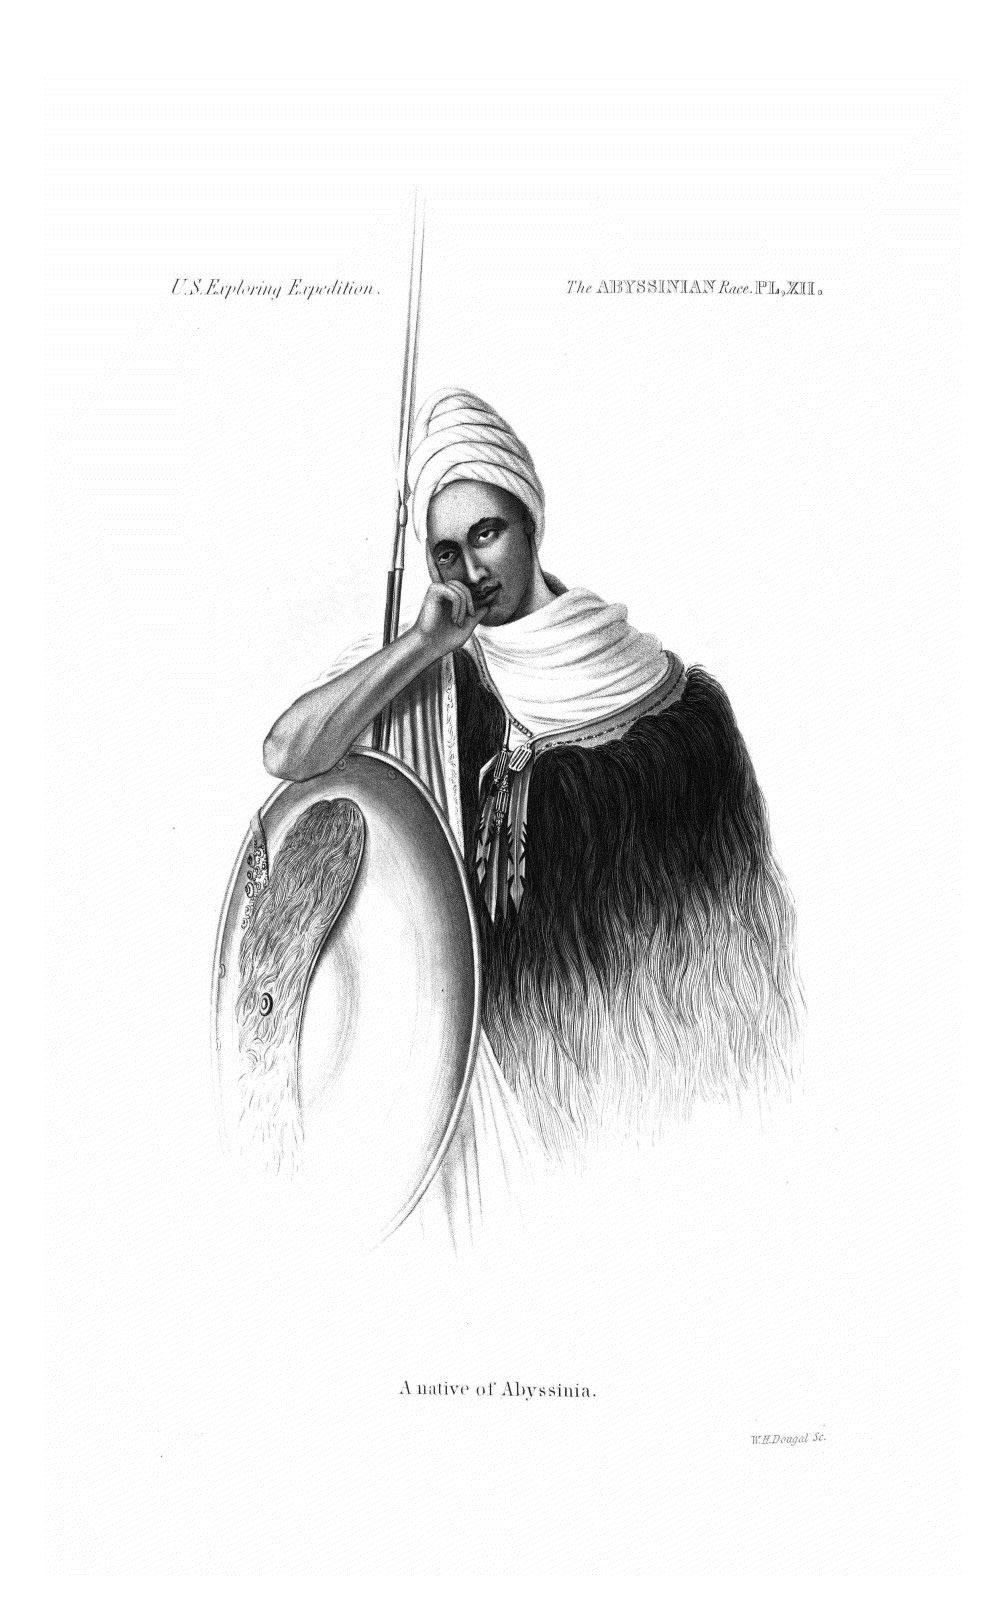 pl XII,  Image number:Sil19-13-249